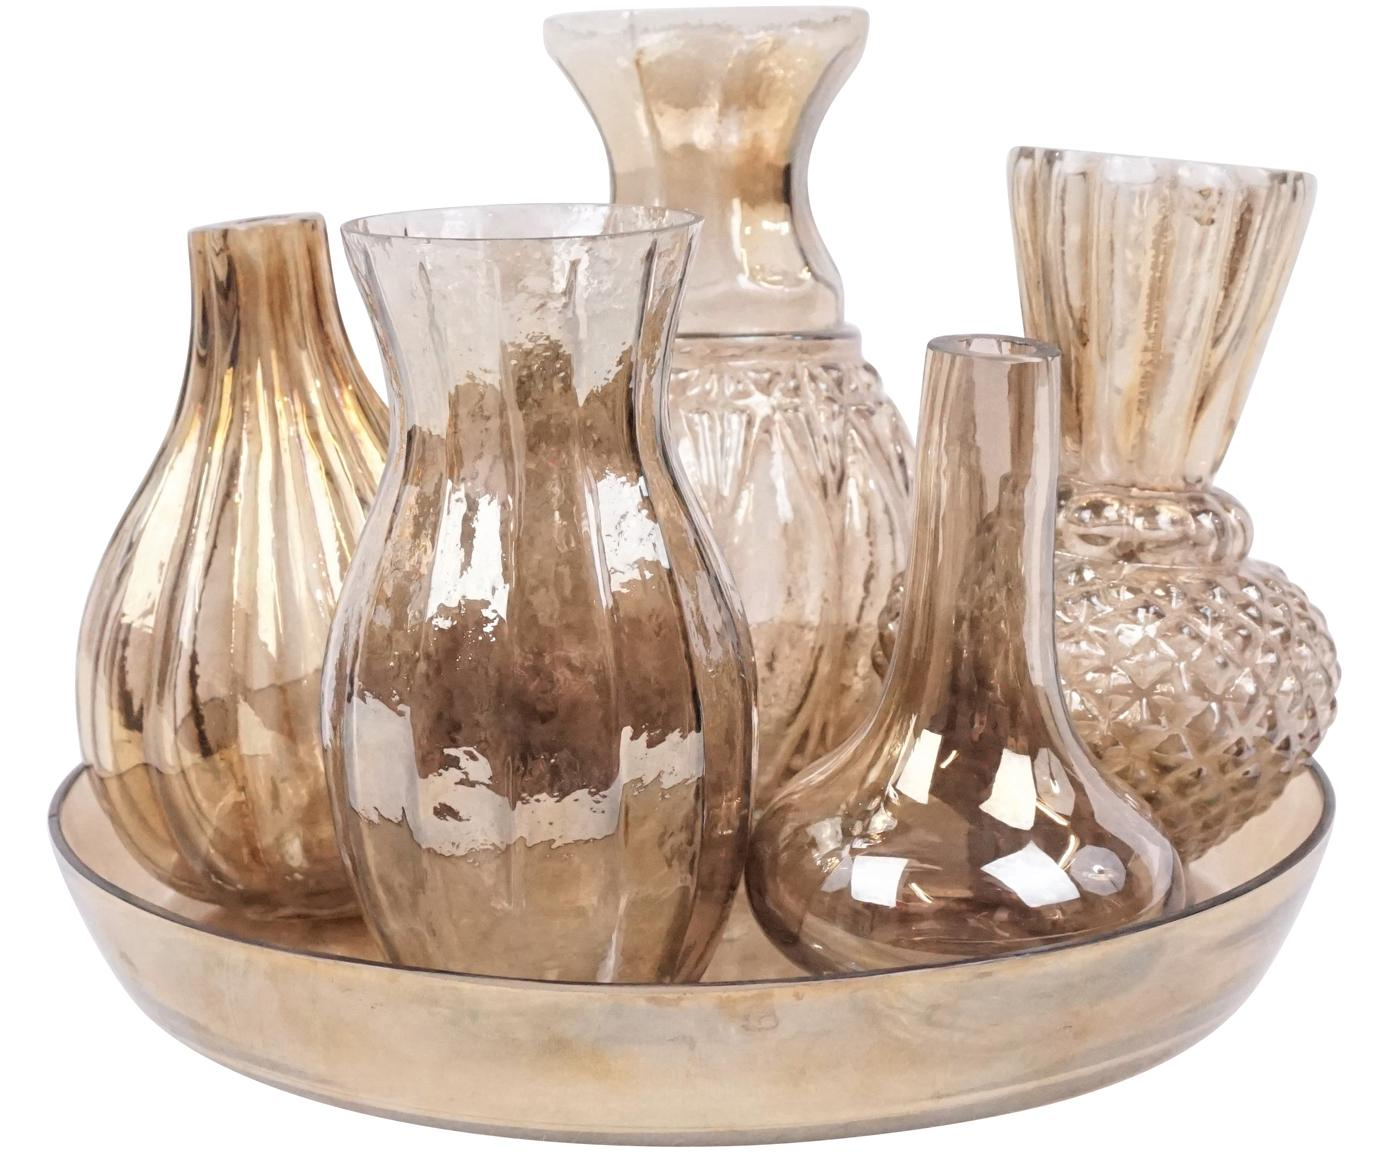 Set de jarrones de vidrio Poesie, 6pzas., Vidrio, Dorado, Set de diferentes tamaños